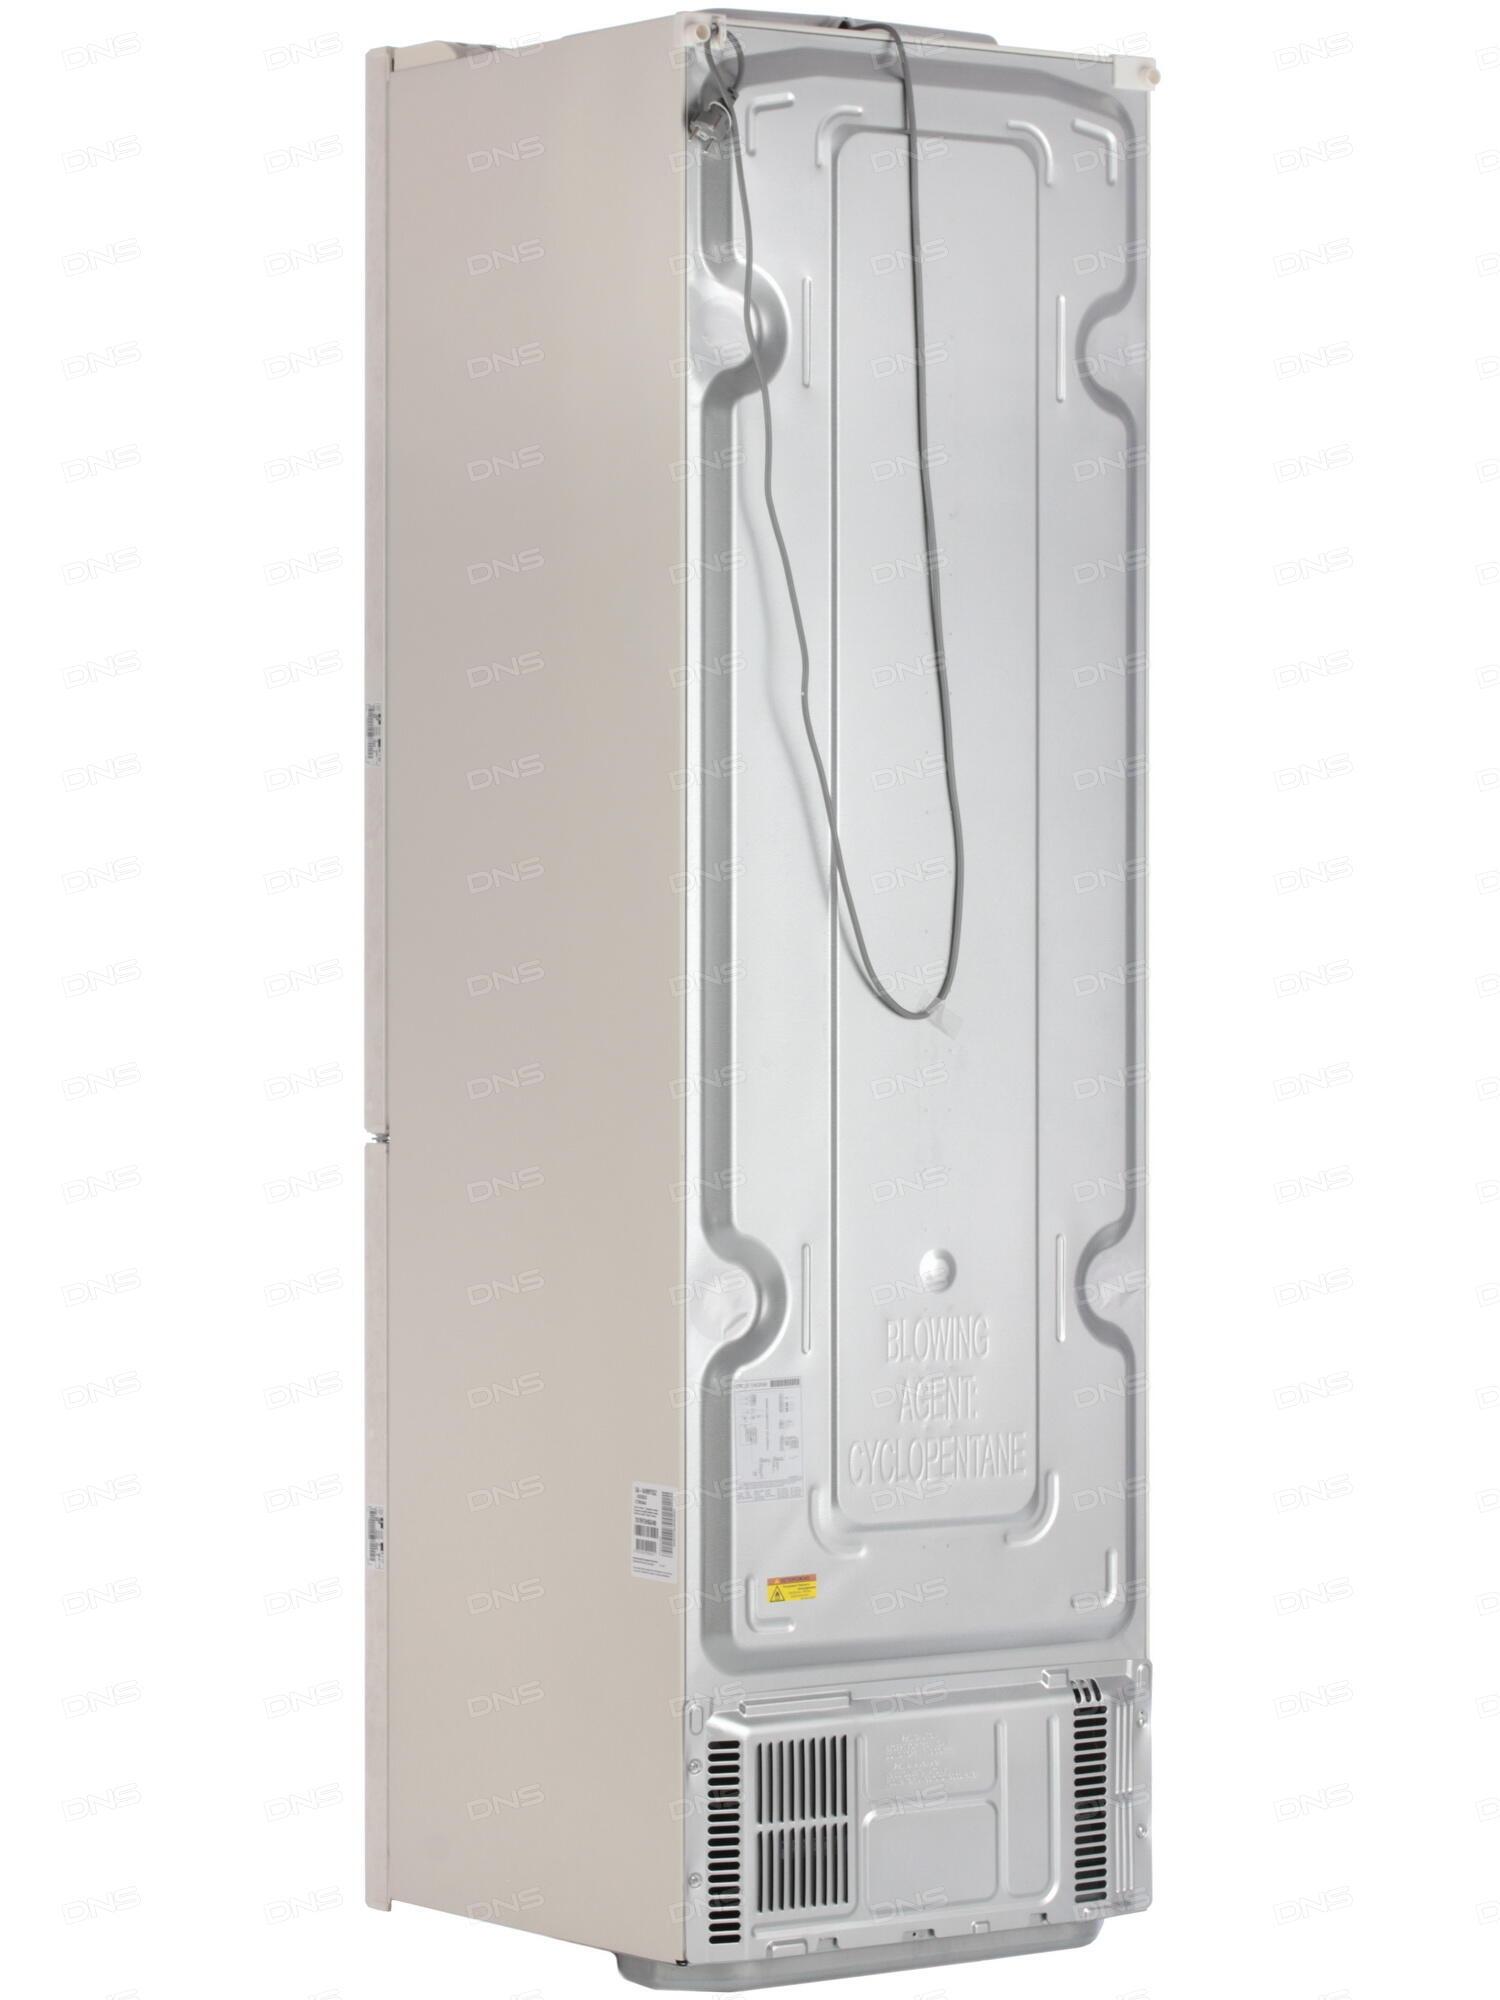 холодильник lg ga b499yeqz купить